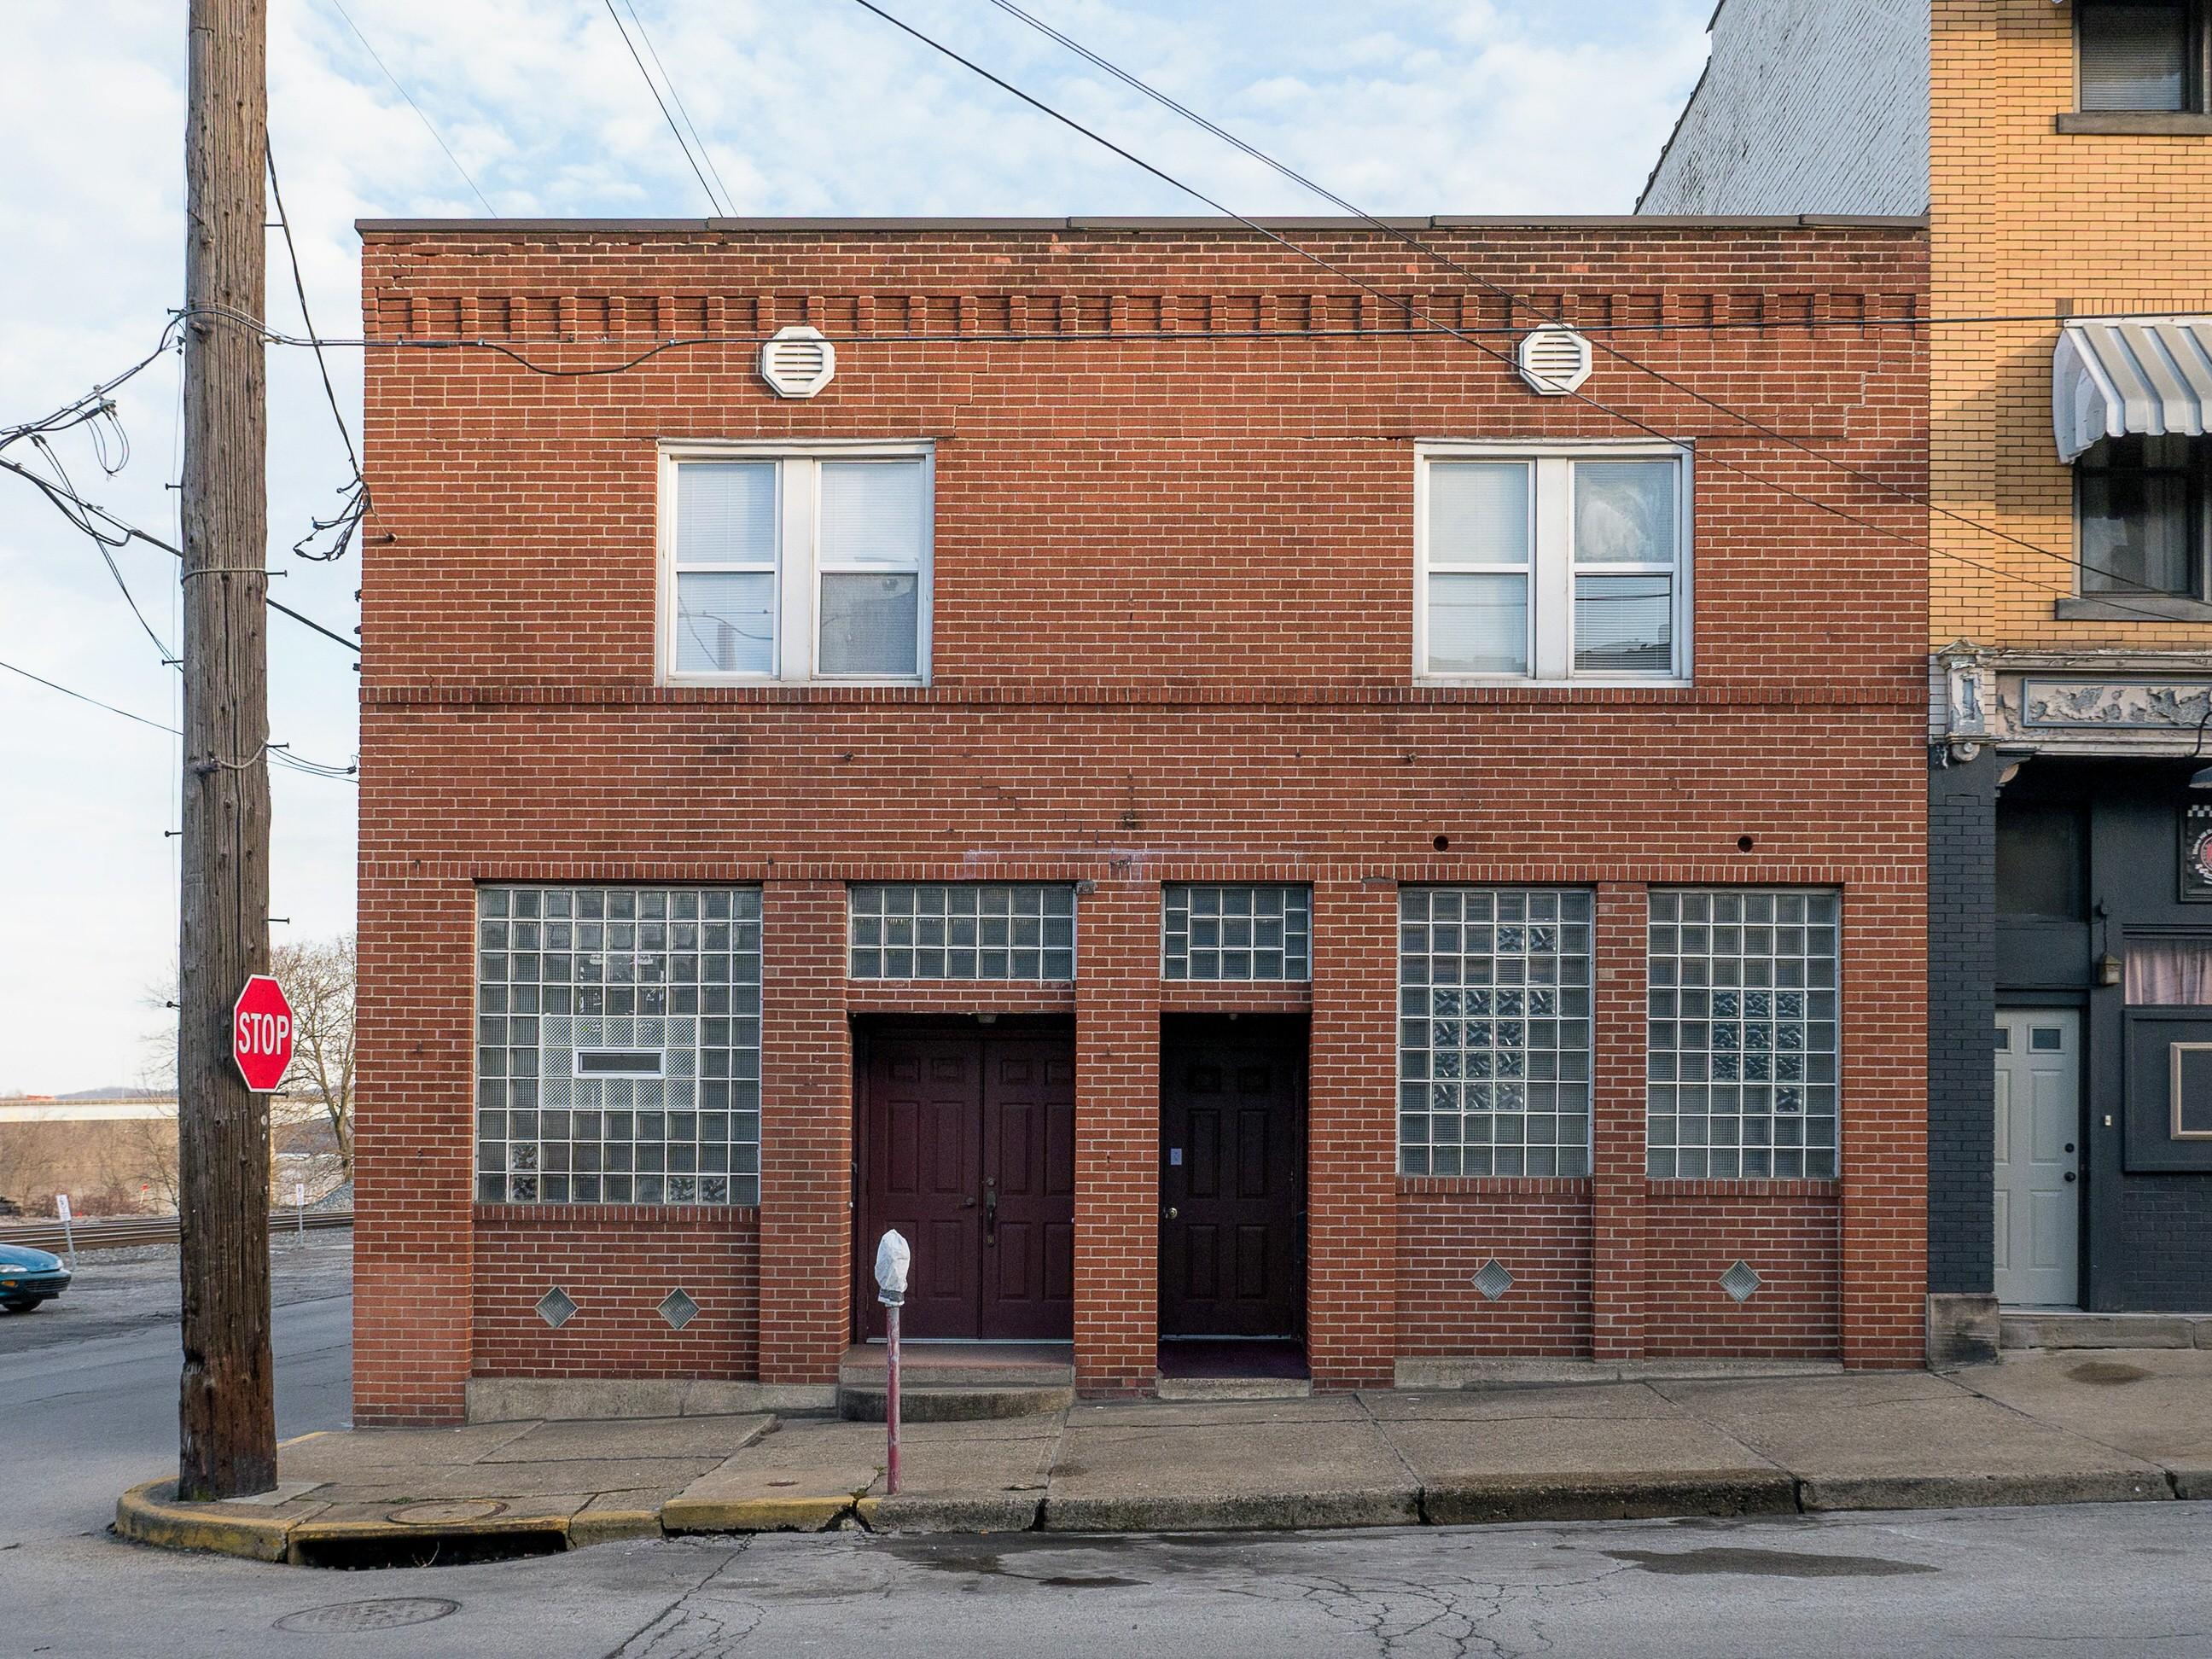 Photo of building at 101 Second Street, Monongahela, Pa. 15063 along rt 88 and rt 136. Photo property of the Monongahela Main Street Program.